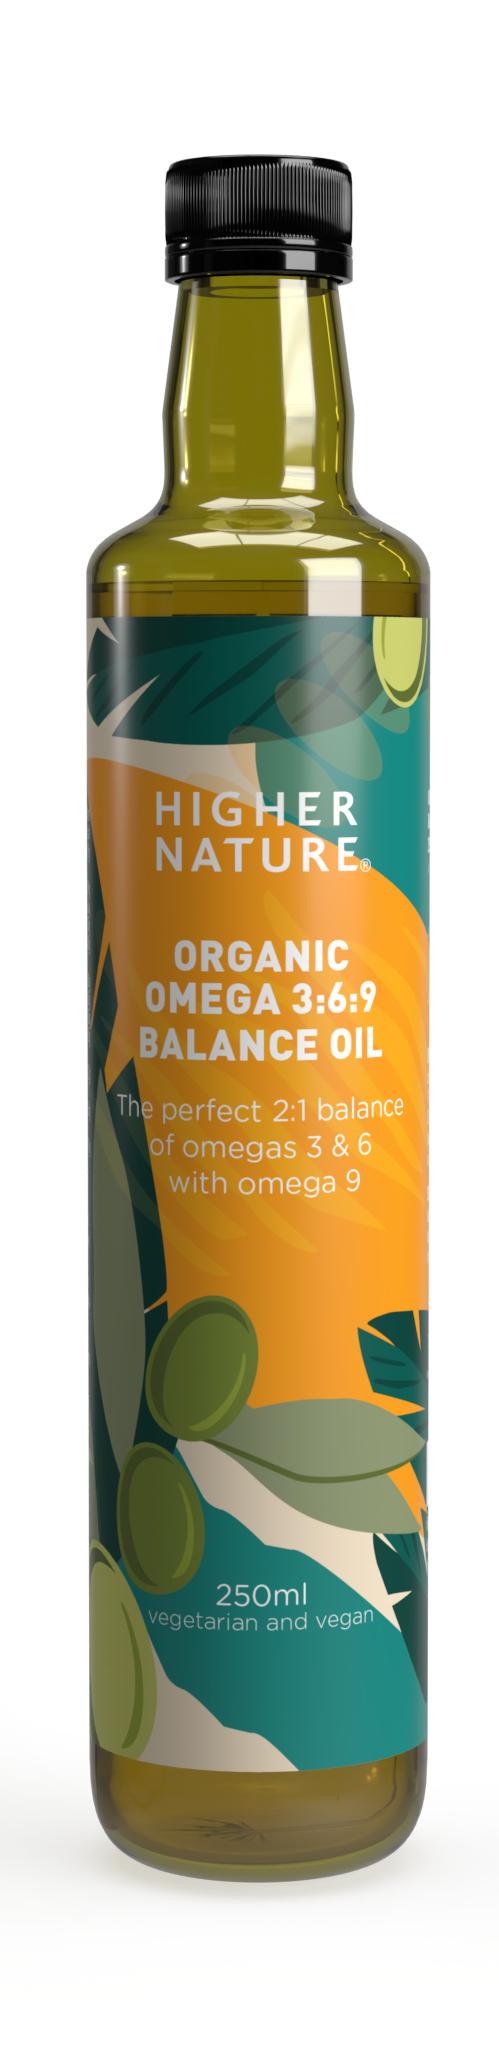 Organic Omega 3:6:9 Balance Oil